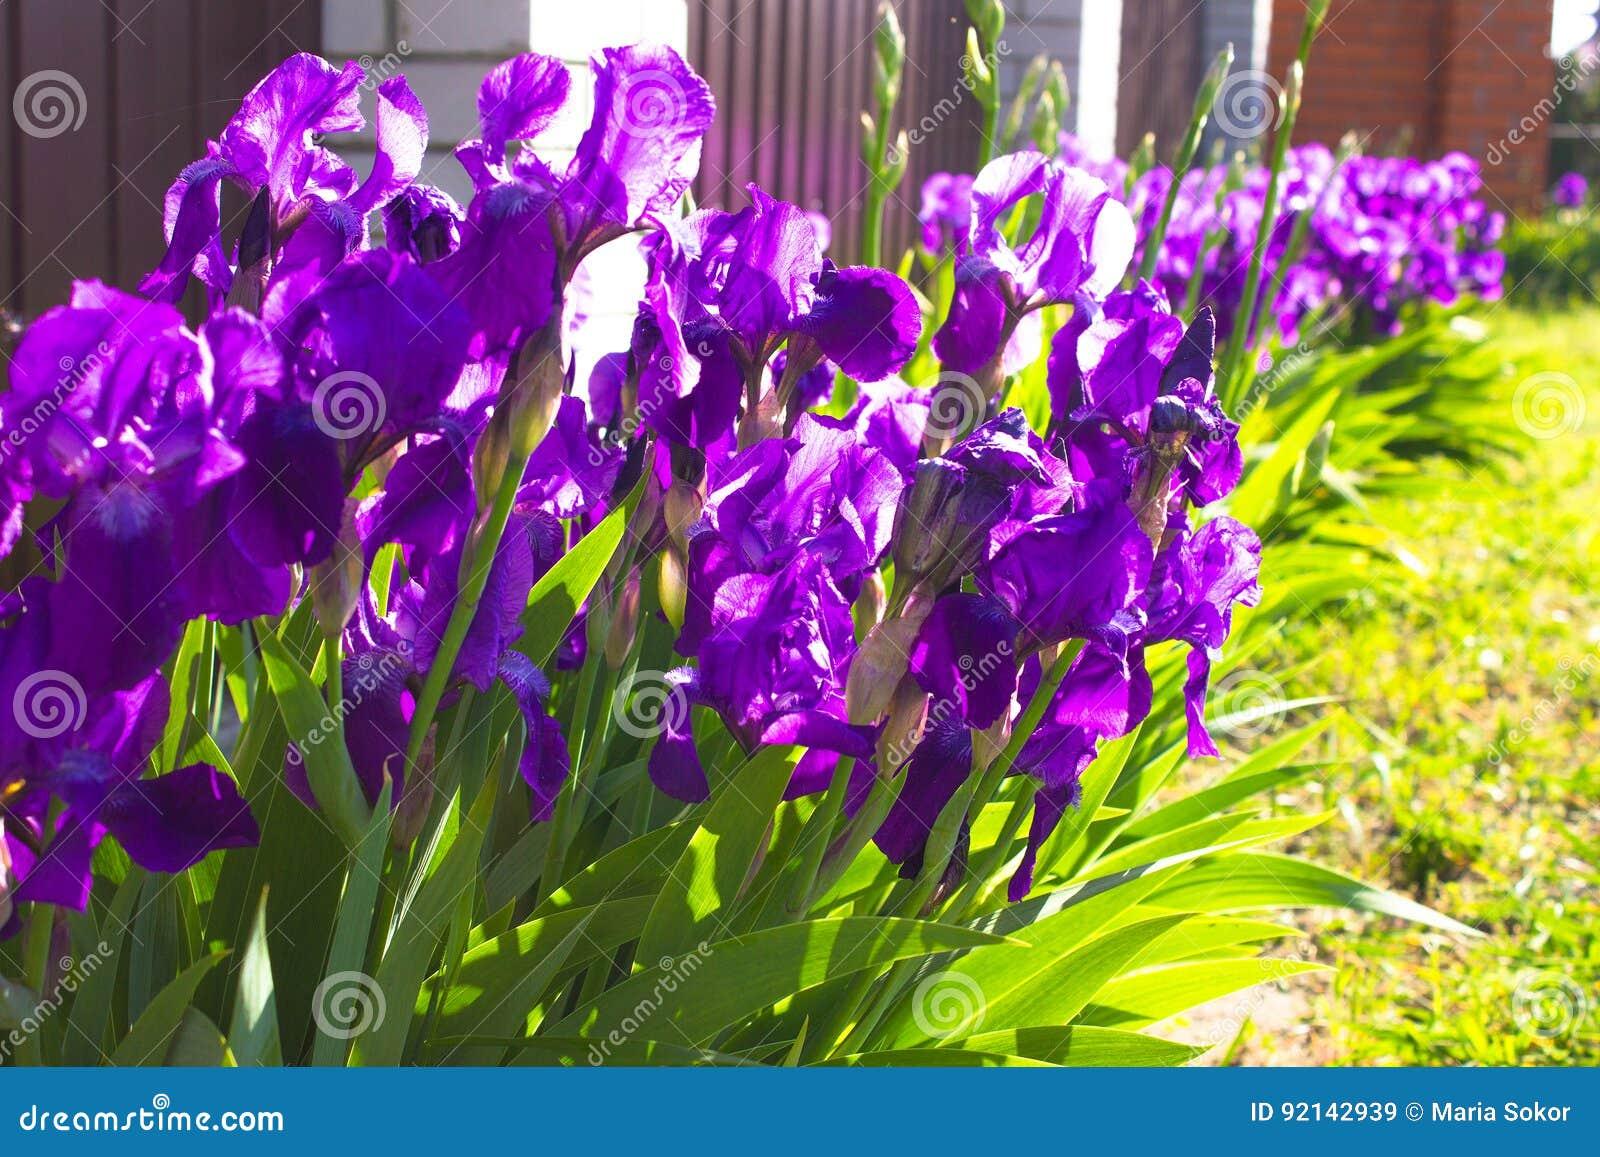 Spring Flower Background Purple Early Spring Iris Flower Under